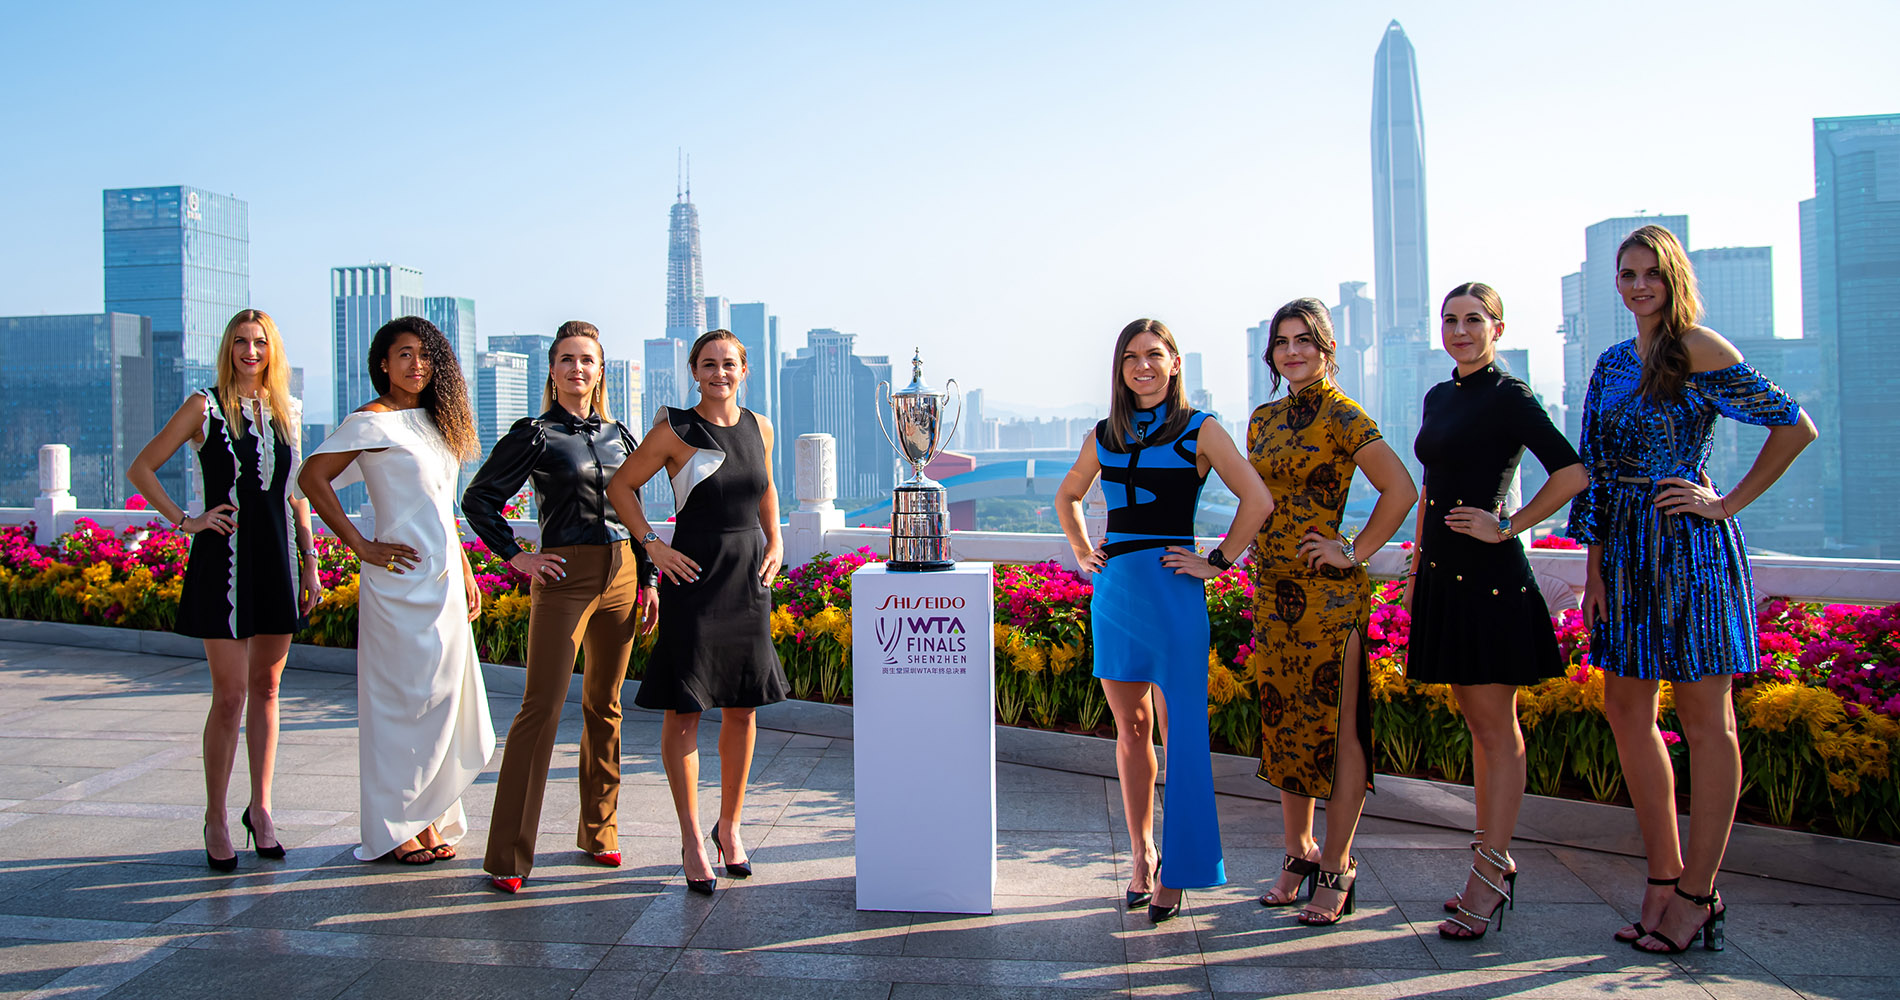 wta shenzhen 2019 - Finale WTA po novem v Mehiki